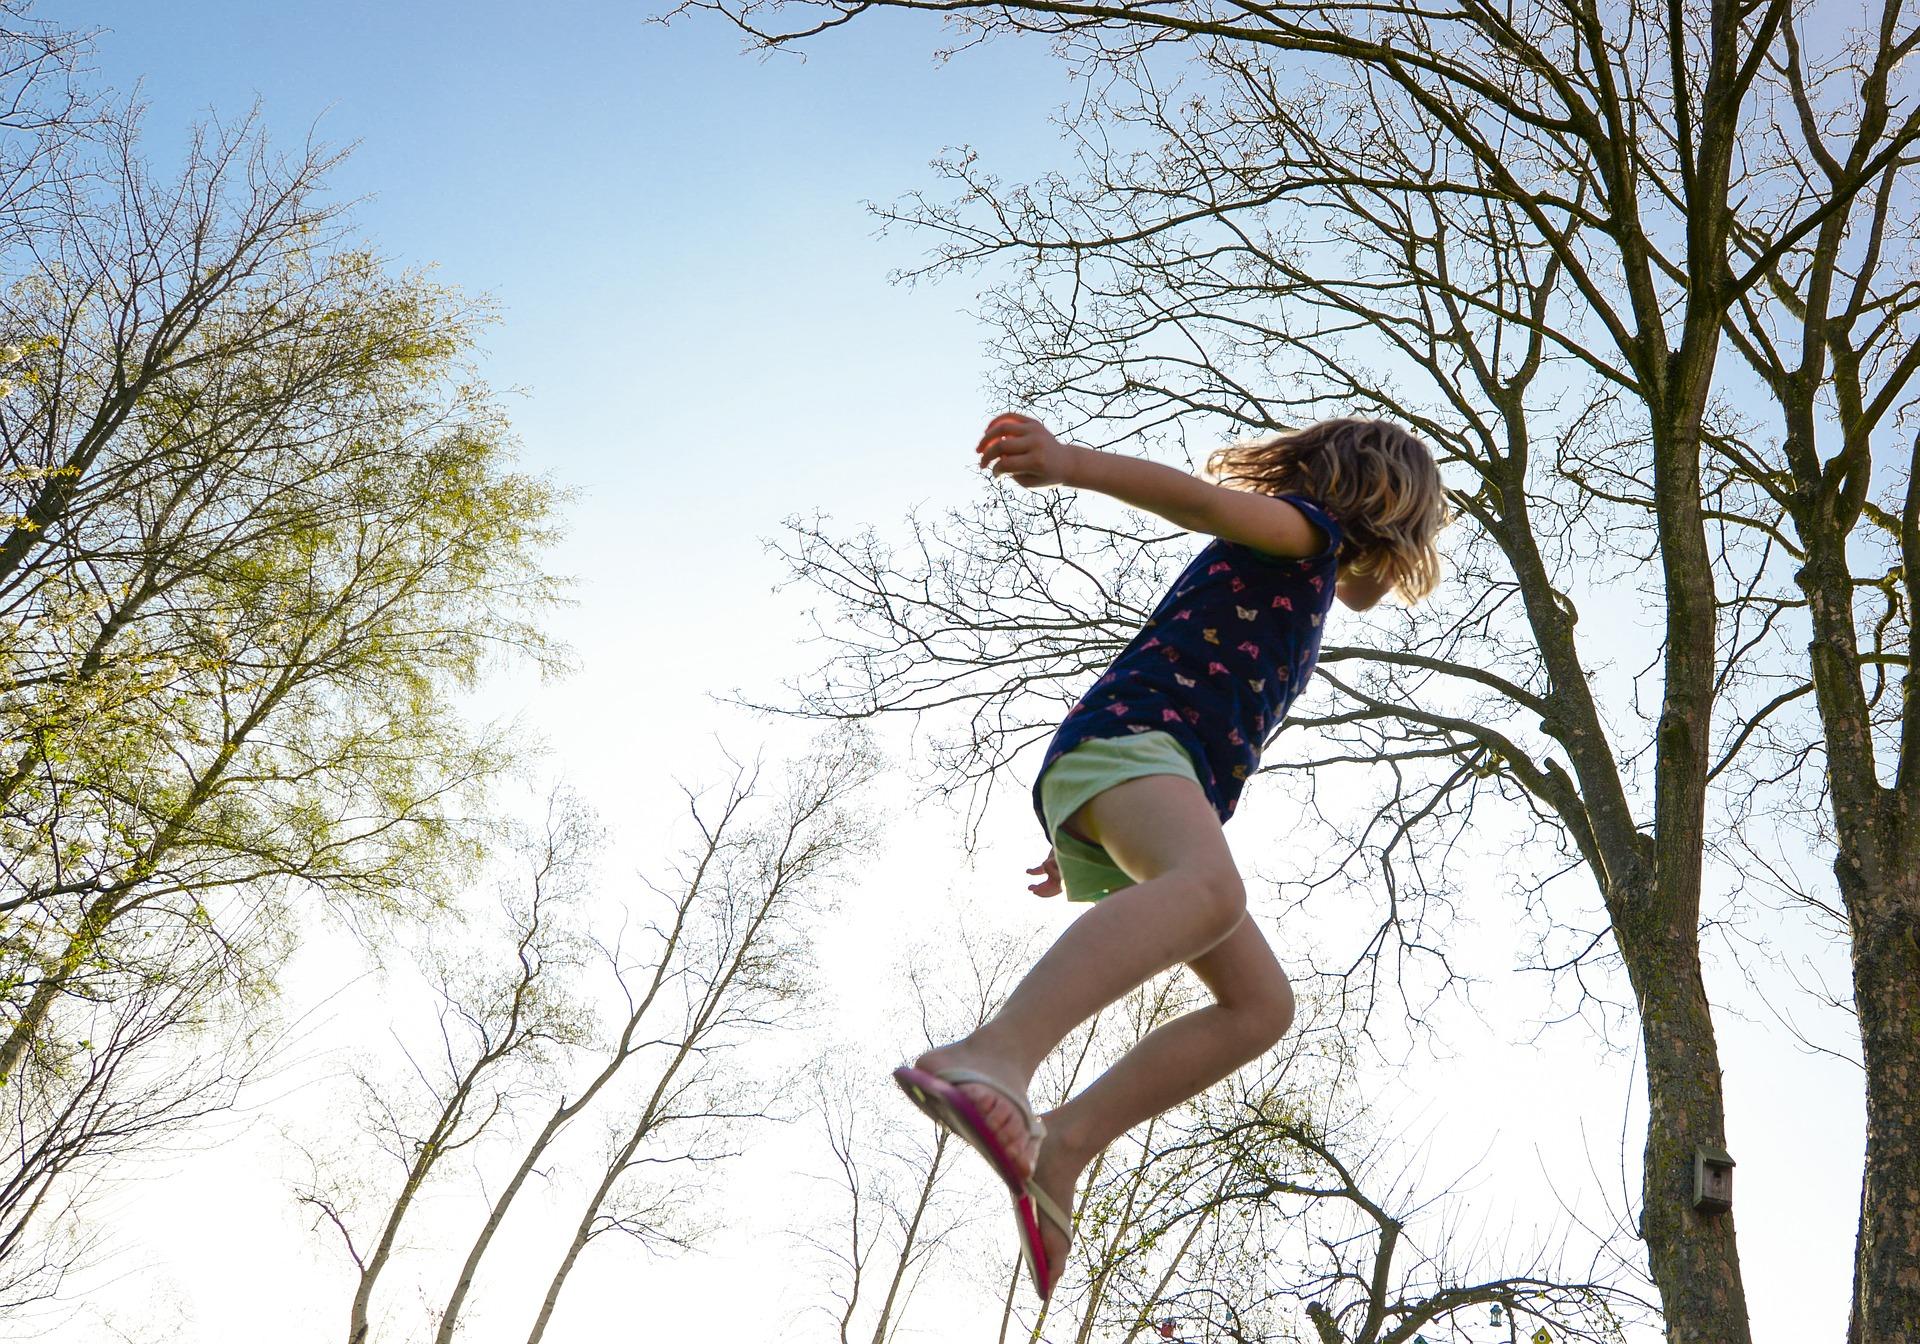 trampoline-2227668_1920.jpg